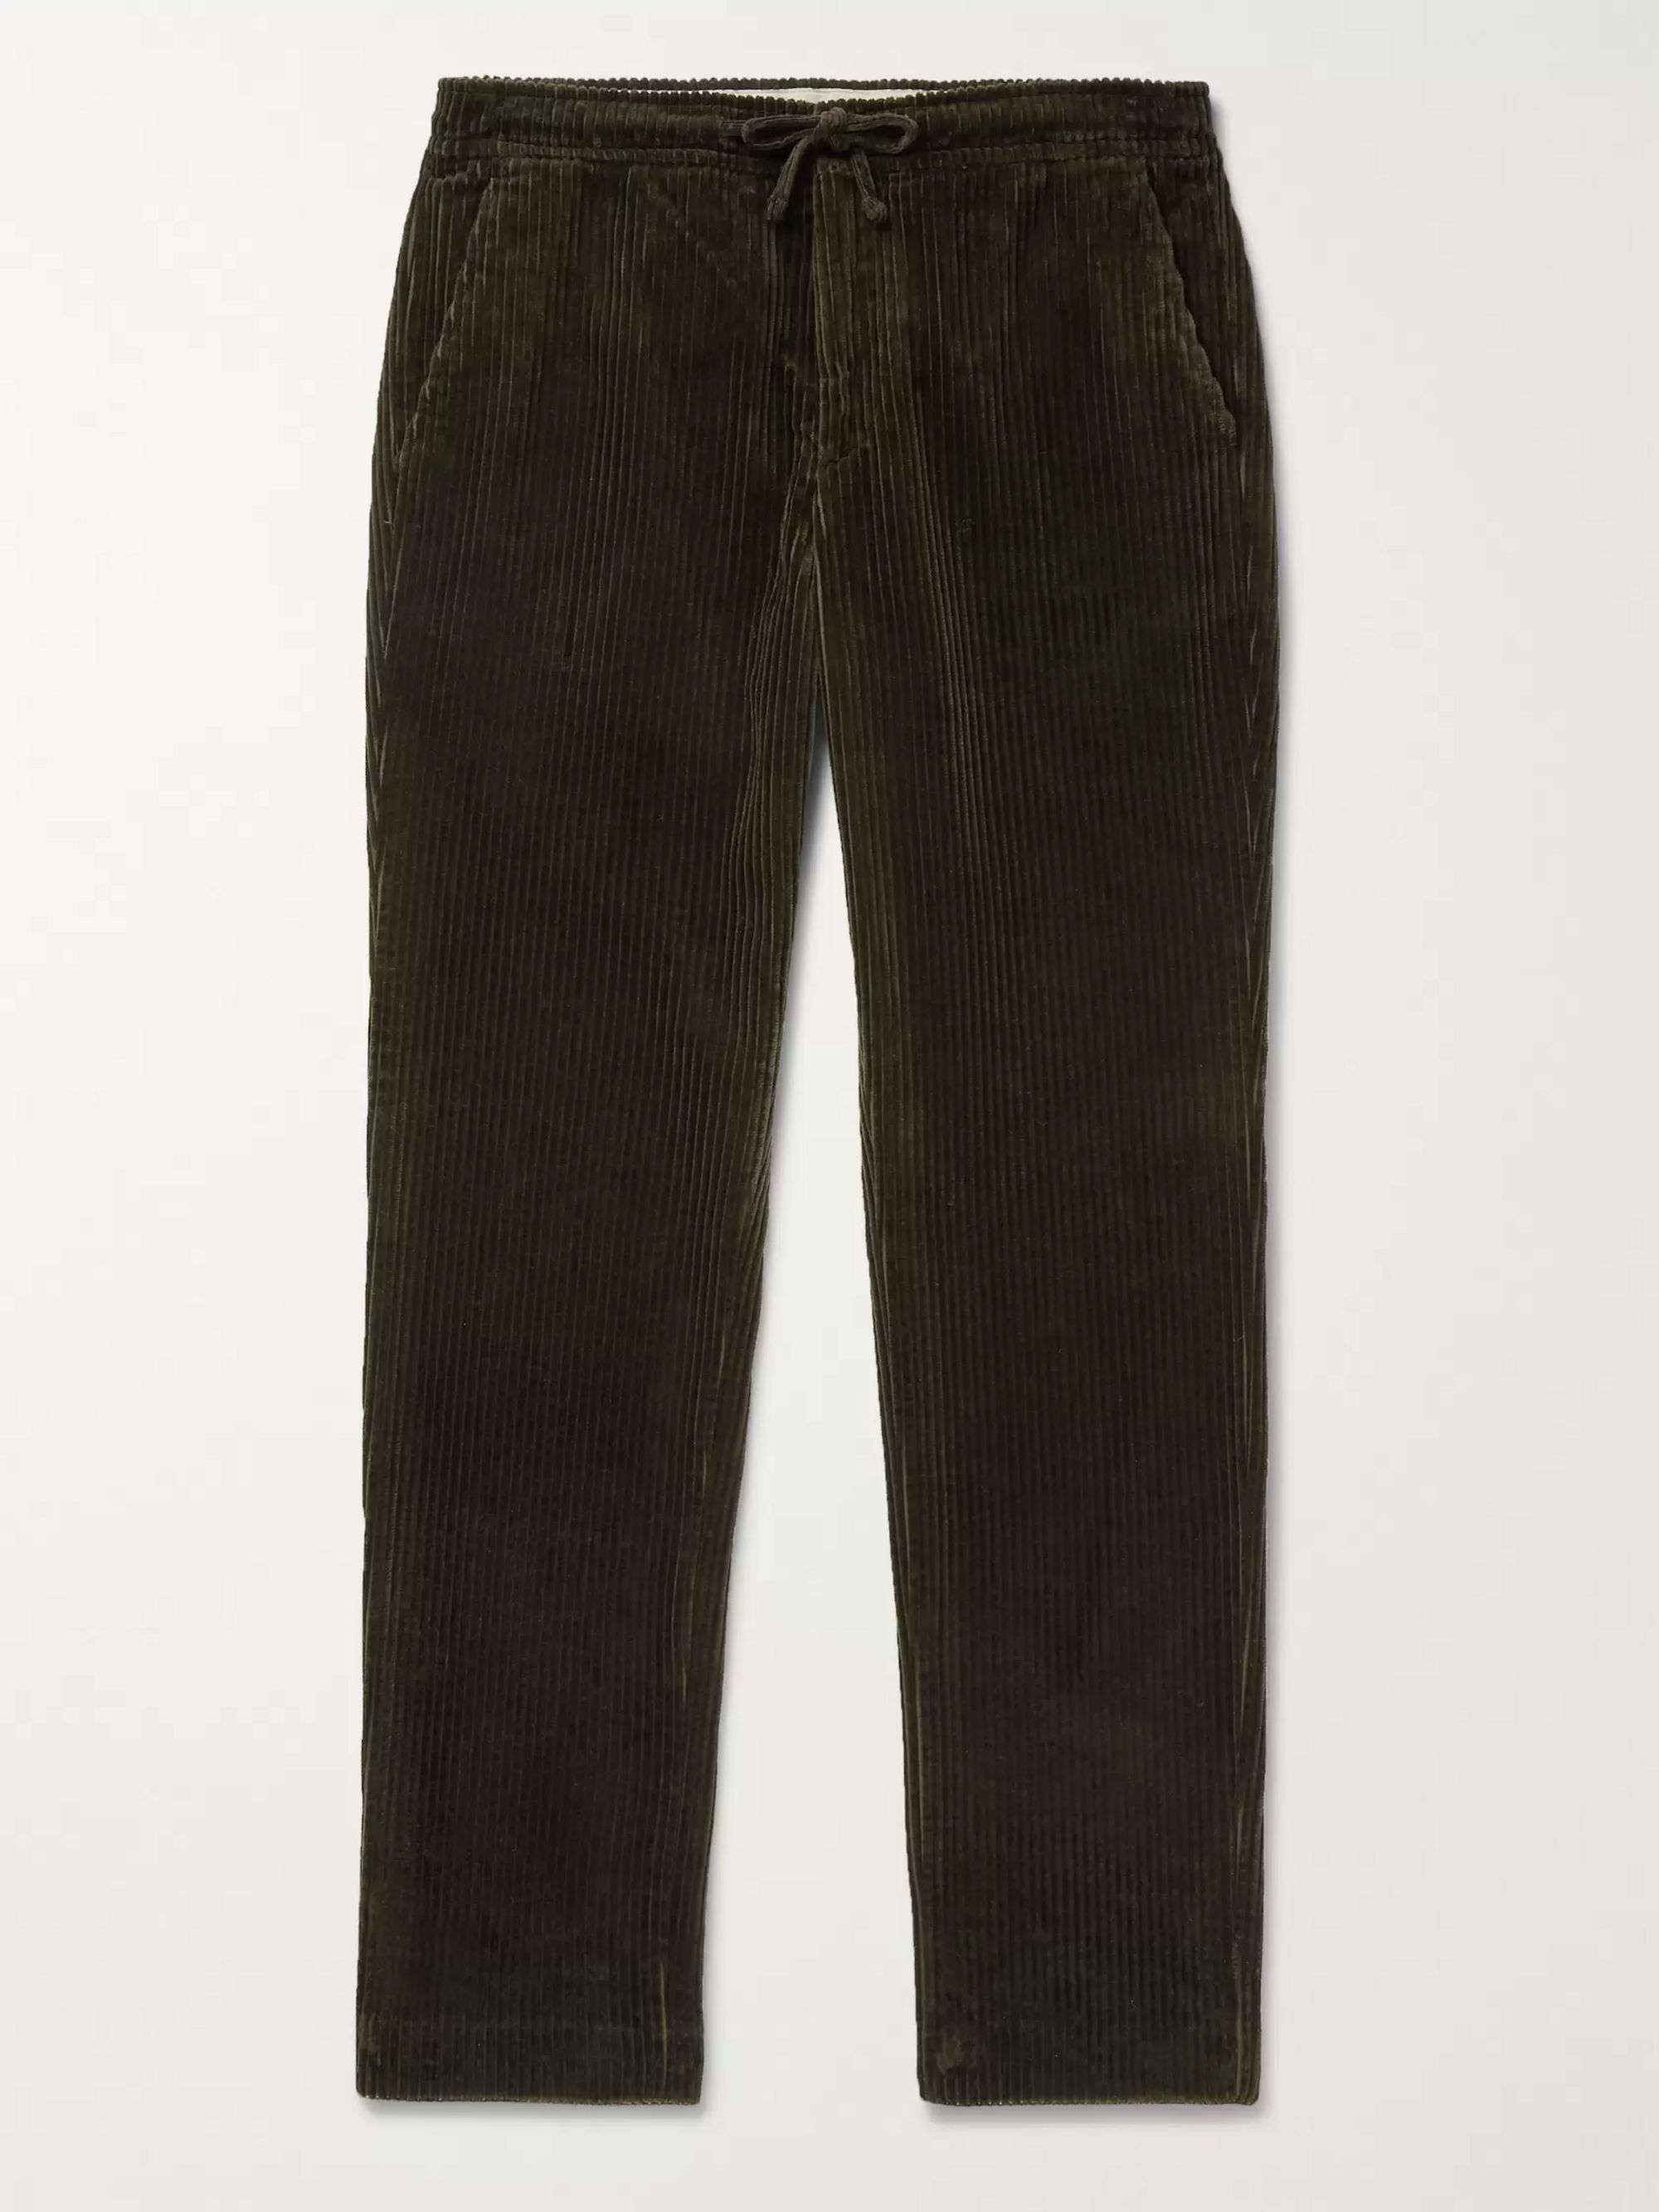 copenhagen-slim-fit-cotton-corduroy-drawstring-trousers by nn07